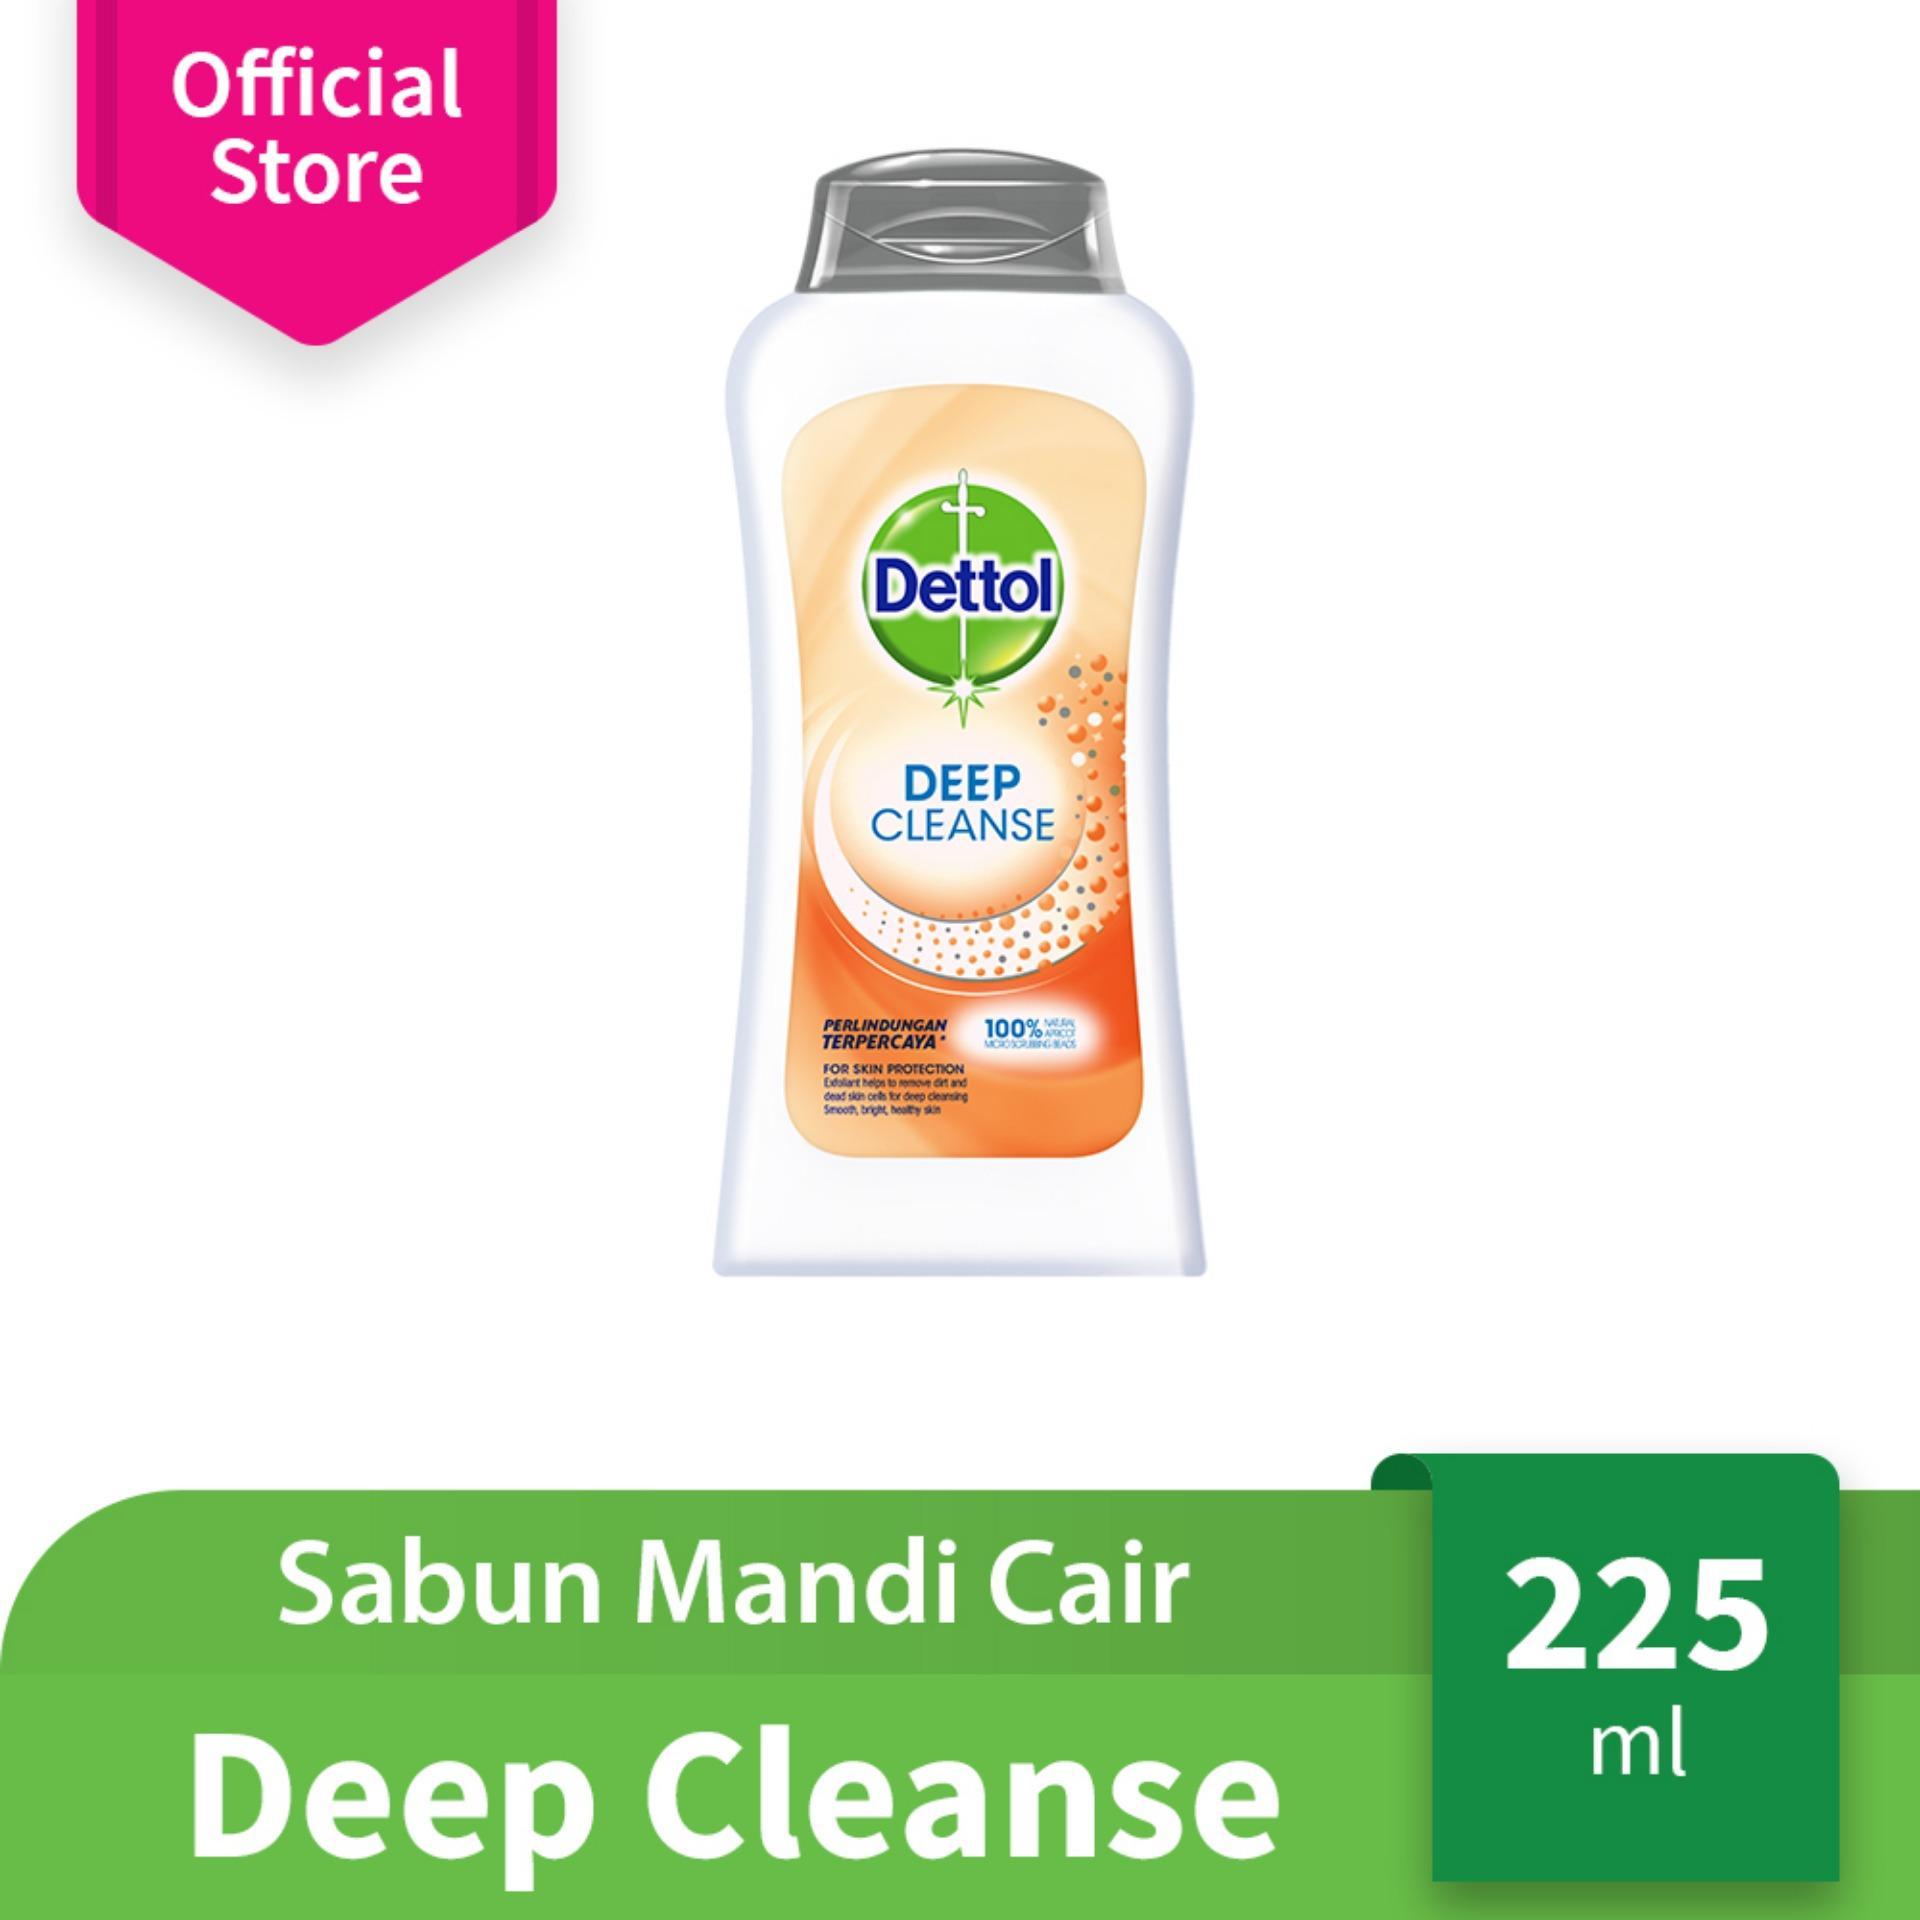 Dettol Sabun Mandi Cair Deep Cleanse Bottle 225ml Body Wash Anti Kuman